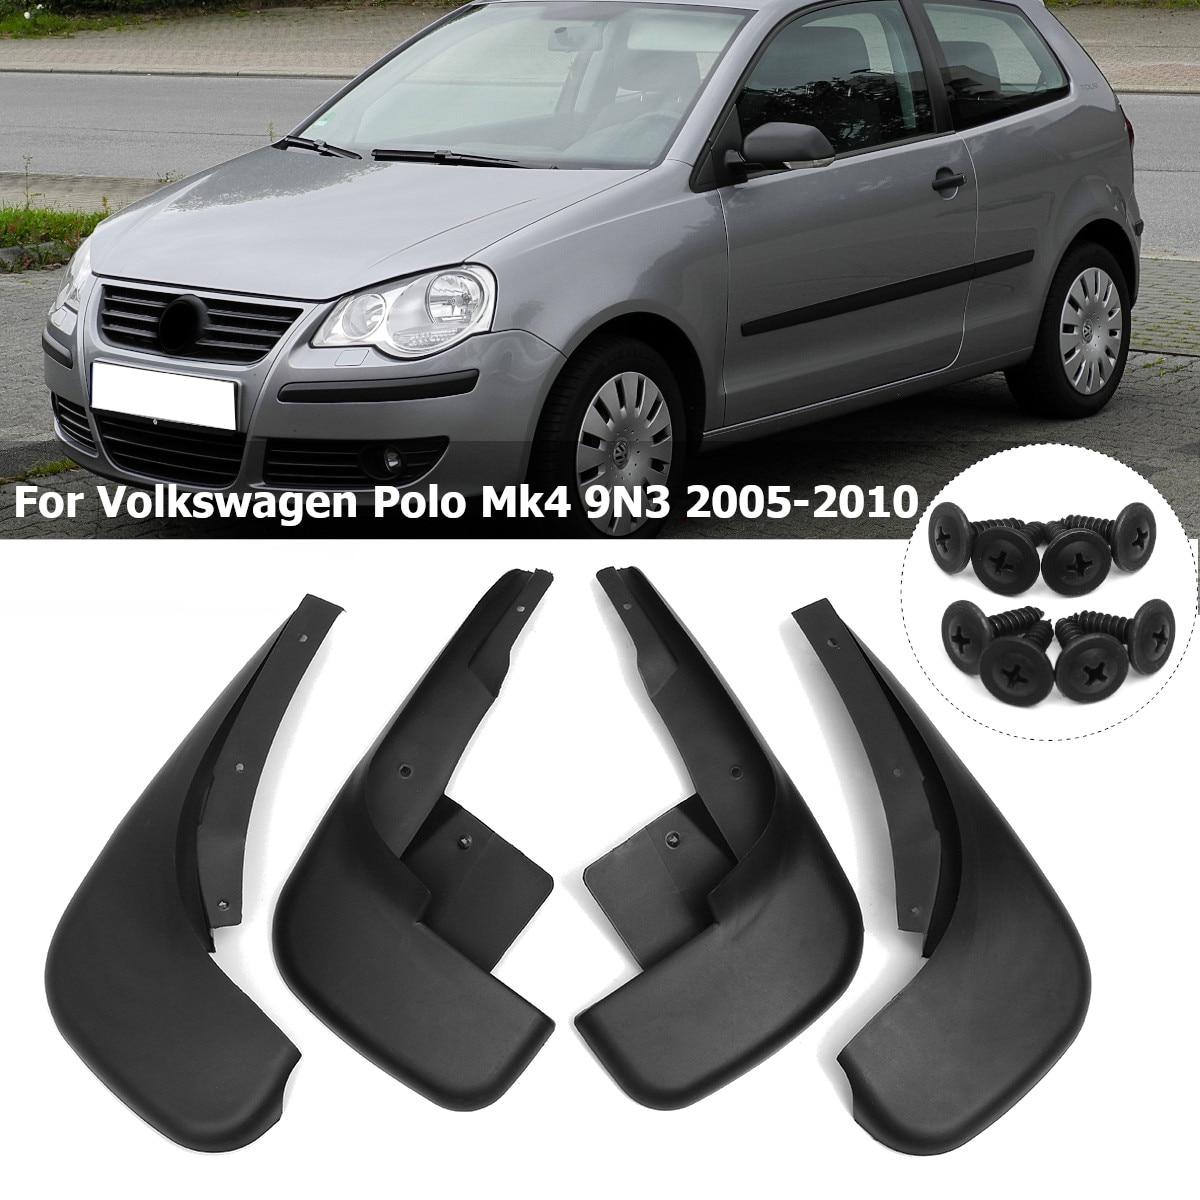 Брызговики для VW Polo Mk4 9N3 2005-2009 Автомобильный крыло брызговики передние задние брызговики, аксессуары